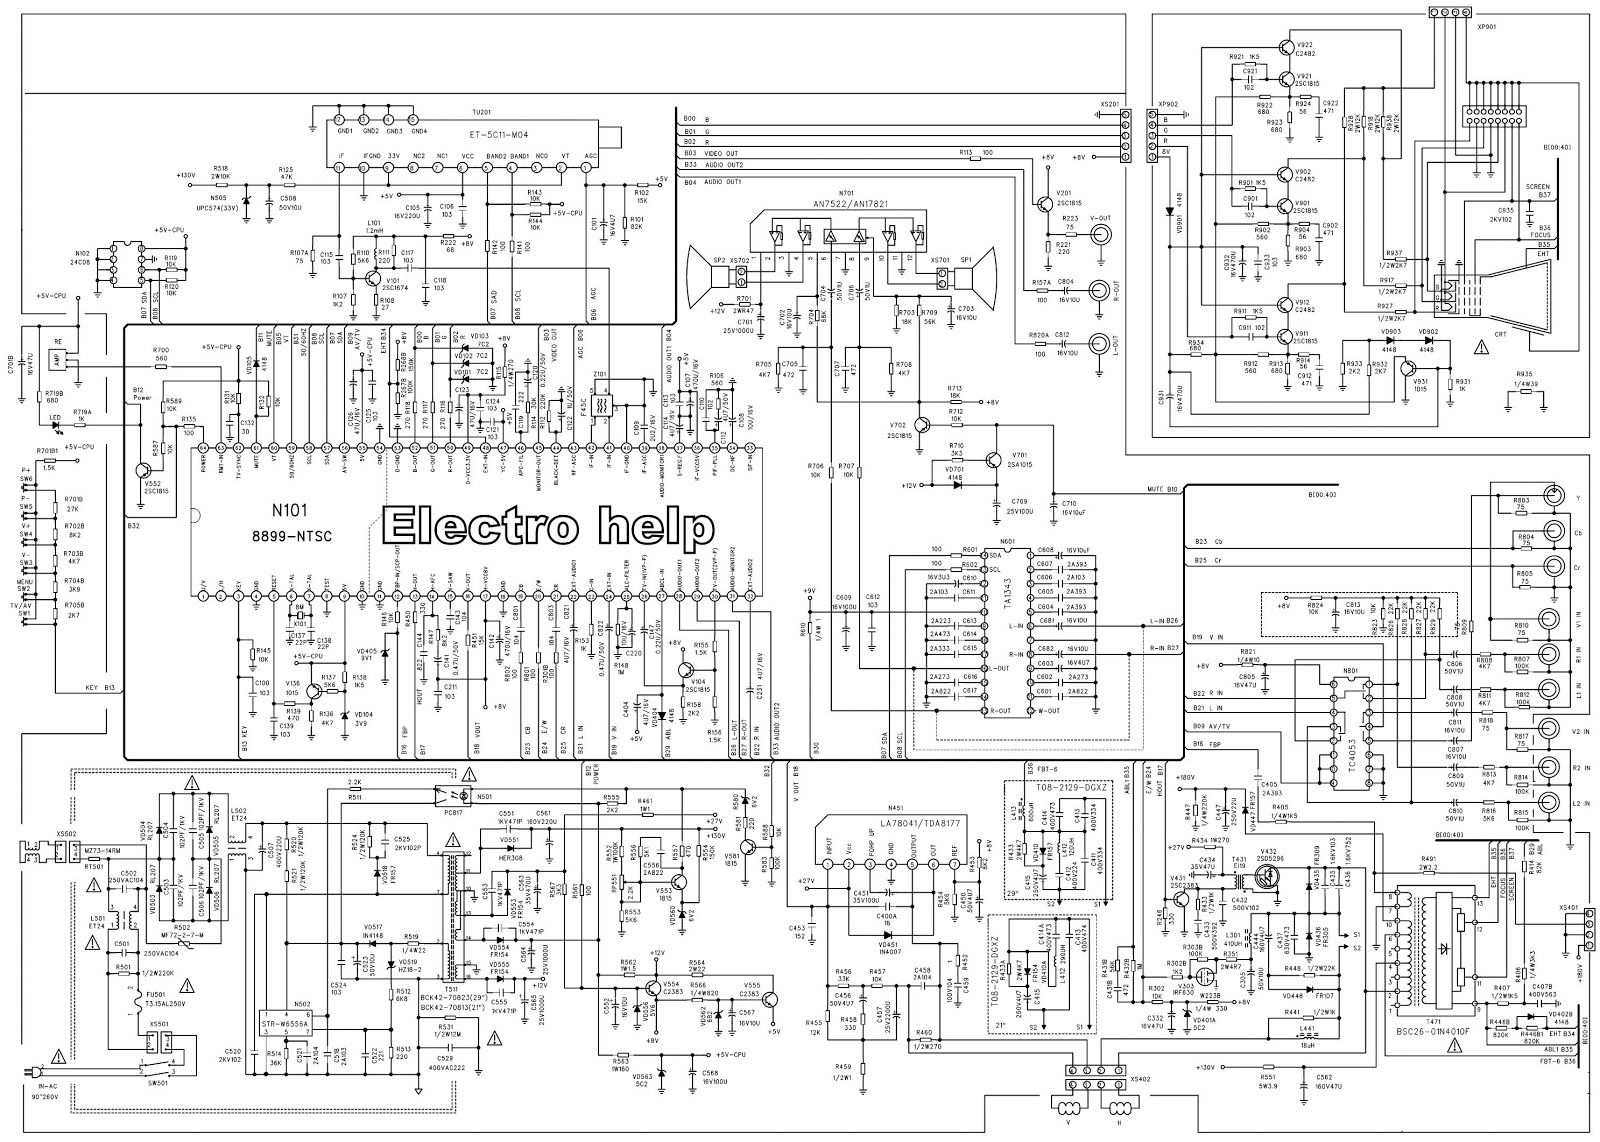 sansui tv circuit diagram free download circuit diagram imagessansui tv circuit diagram free download circuit diagram [ 1600 x 1142 Pixel ]